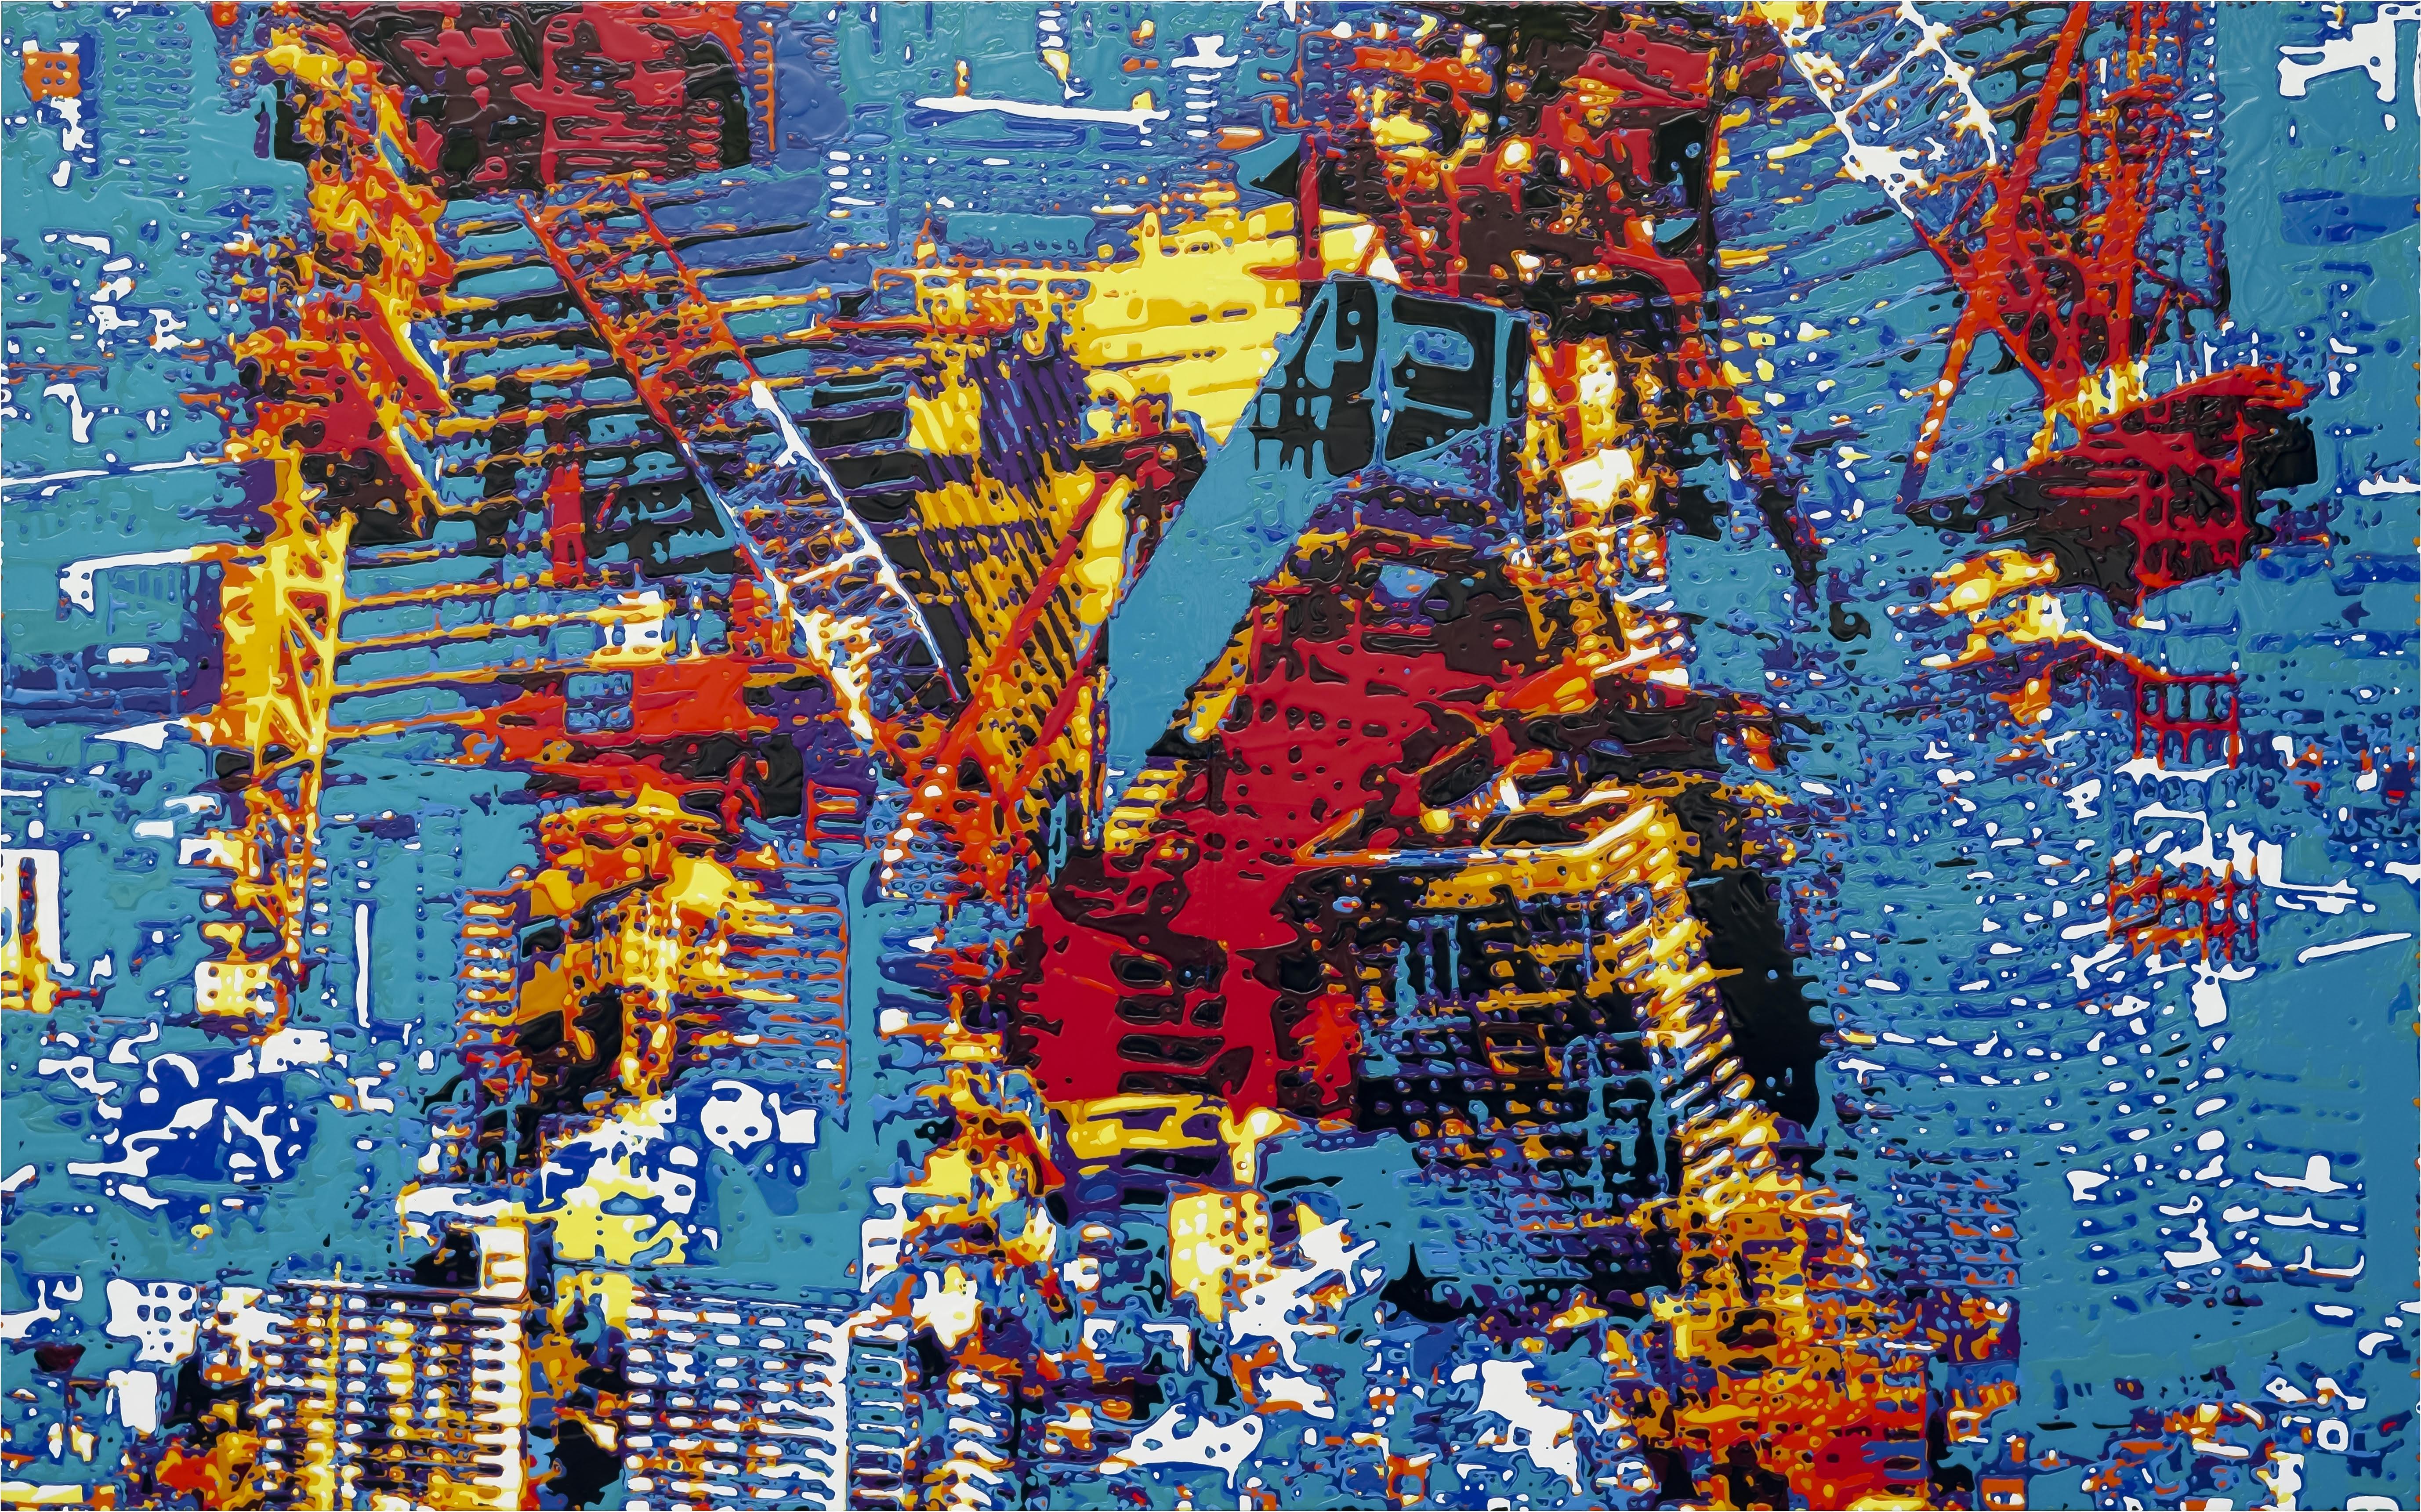 《Drip color memory on October 13,2017.》 2018 H193.9×W390.9×D6cm パネル、綿布 / アクリル絵具、注射器 (京都造形芸術大学 大学院 修了制作展 優秀賞受賞作品) (C) 2019 TAISUKE KONDOUH Courtesy of GALLERY TOMO